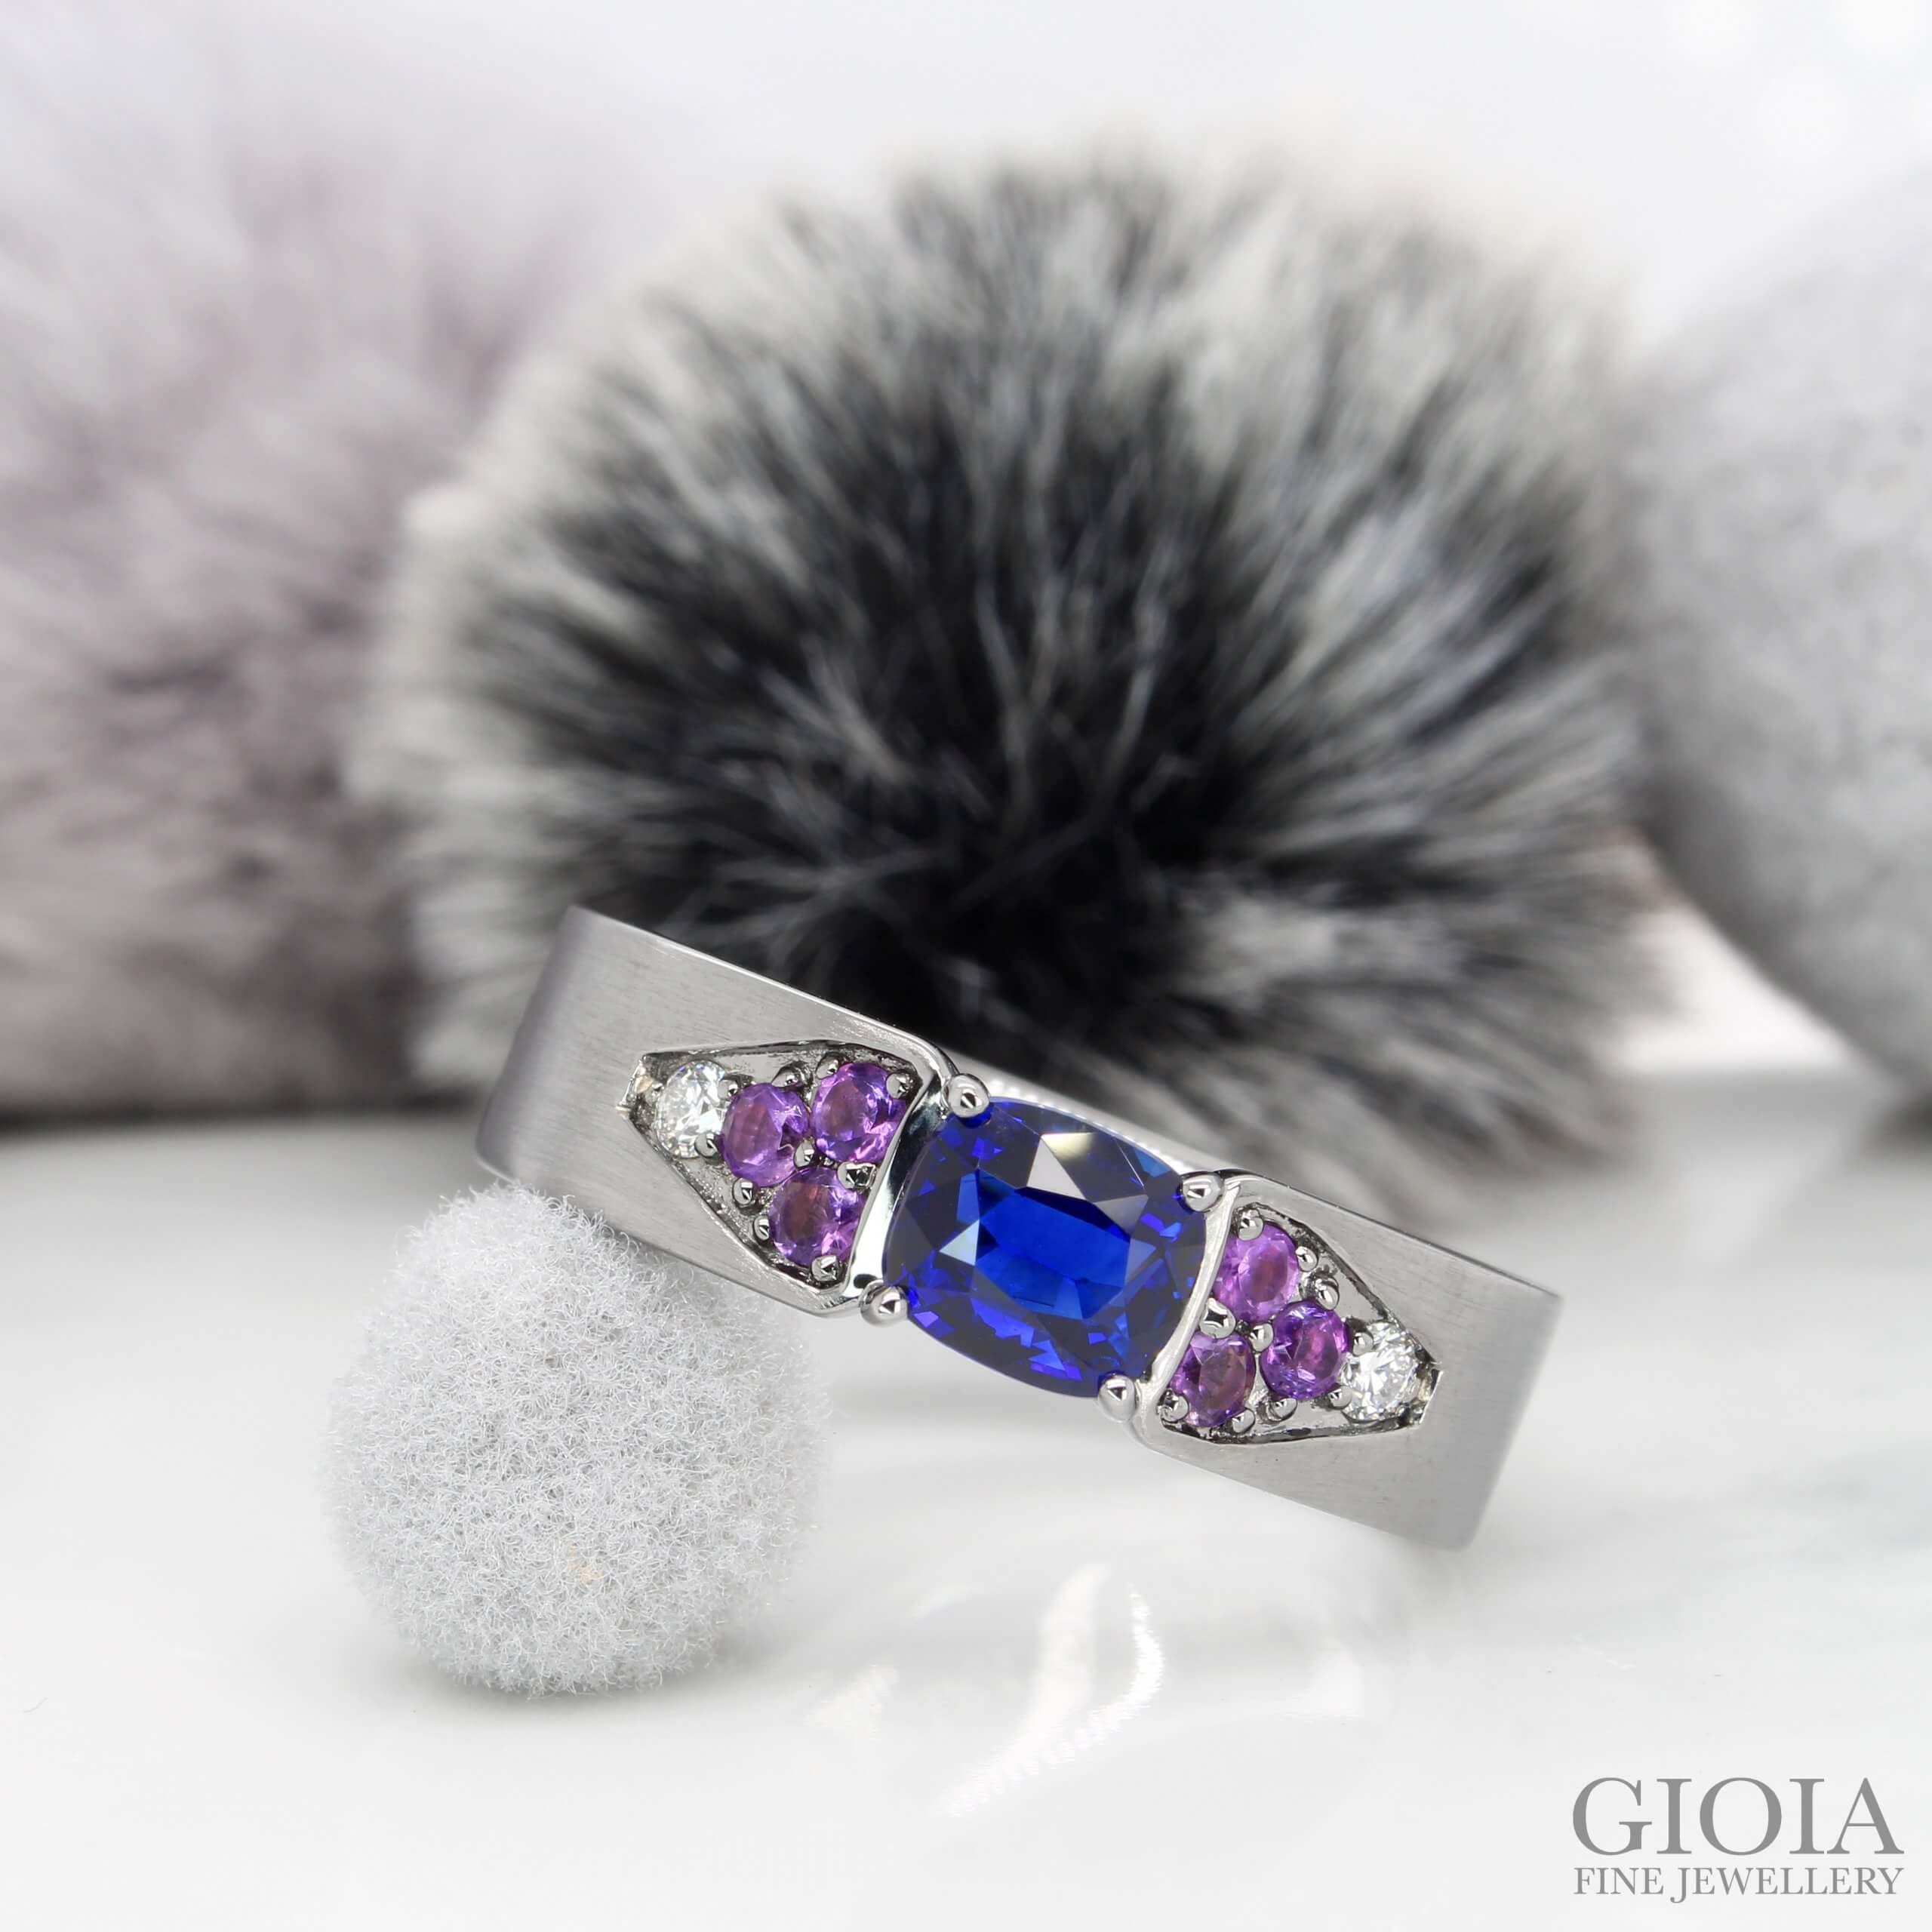 Blue Sapphire Modern Astrology Men's Ring - Royal Blue Sapphire unheated with Amethyst Diamond